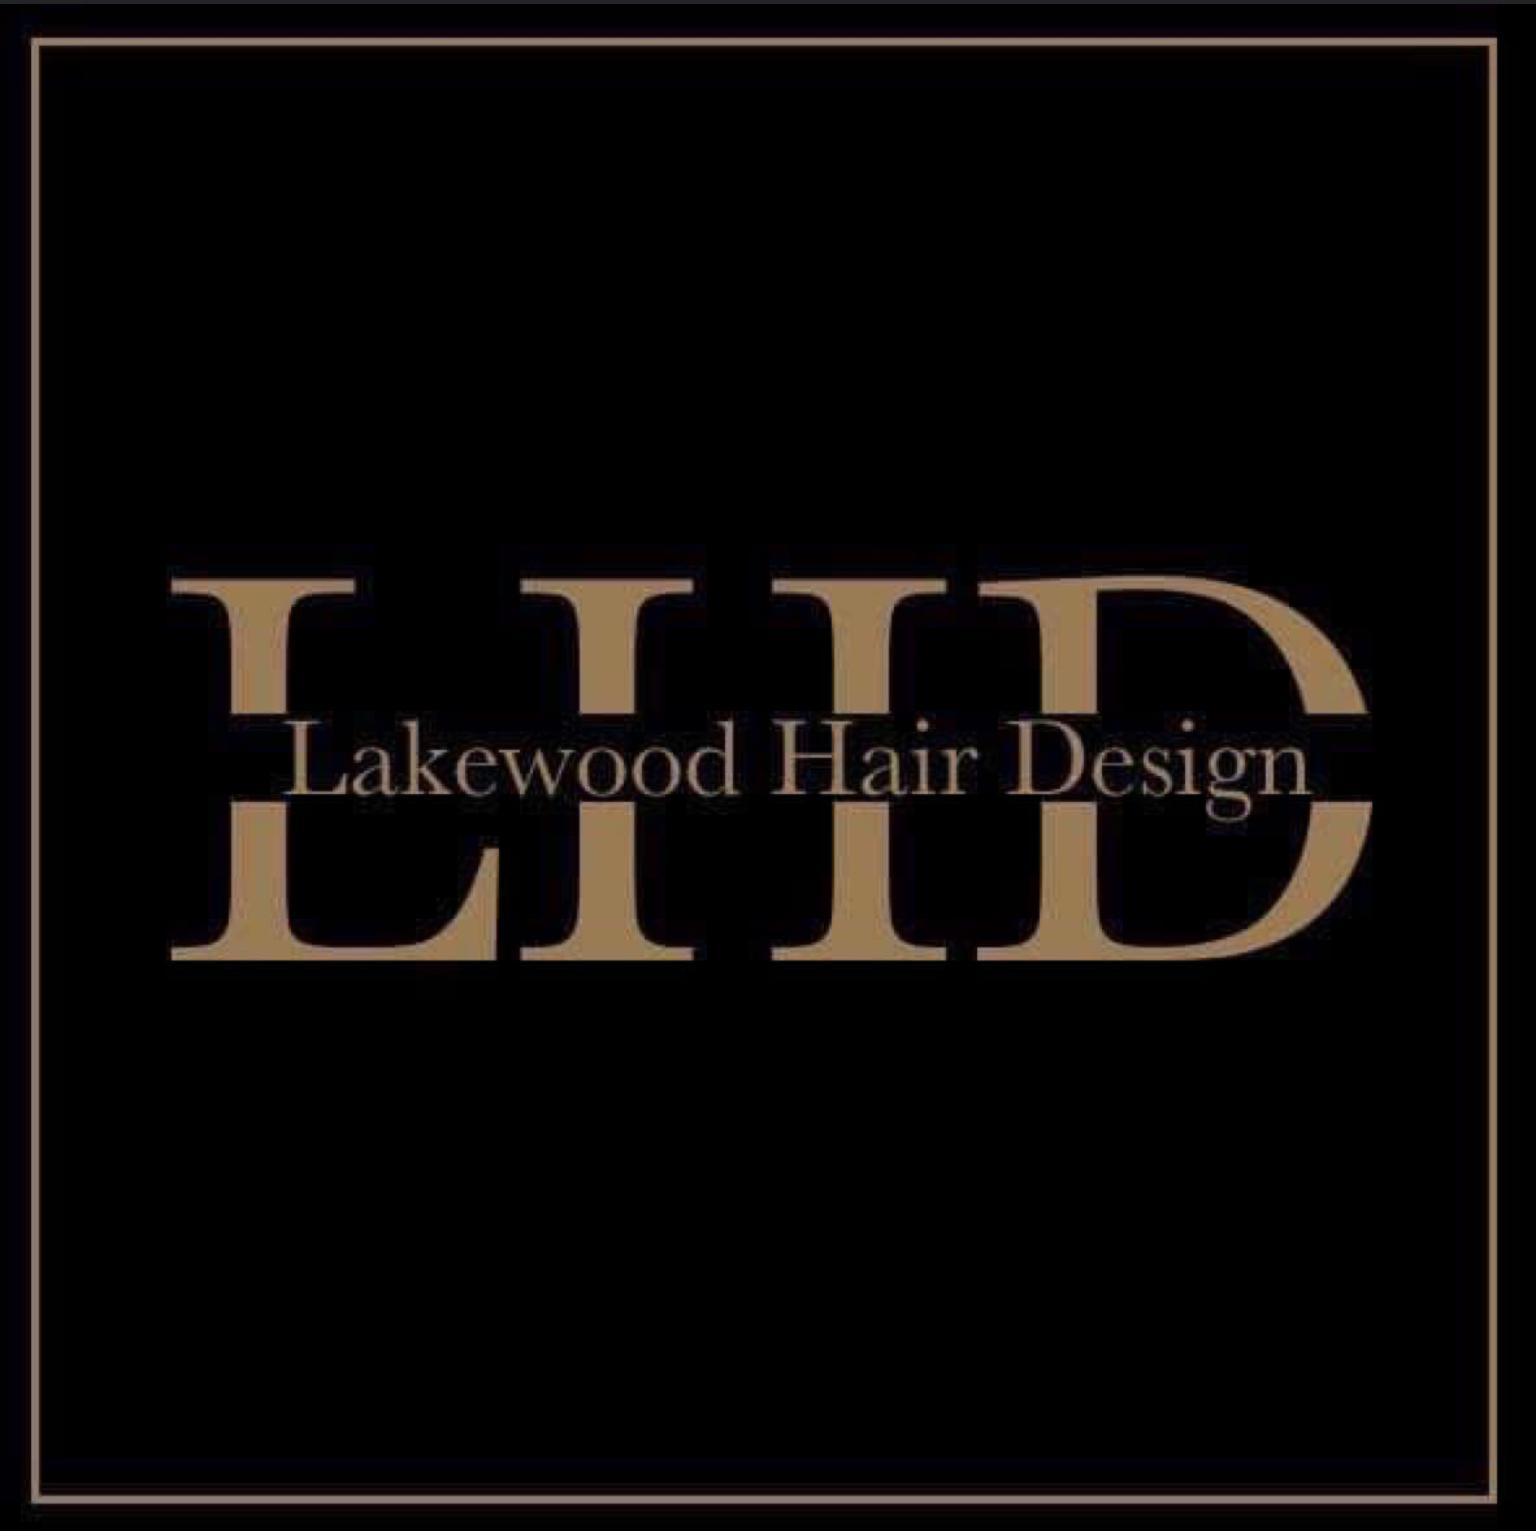 Lakewood Hair Design